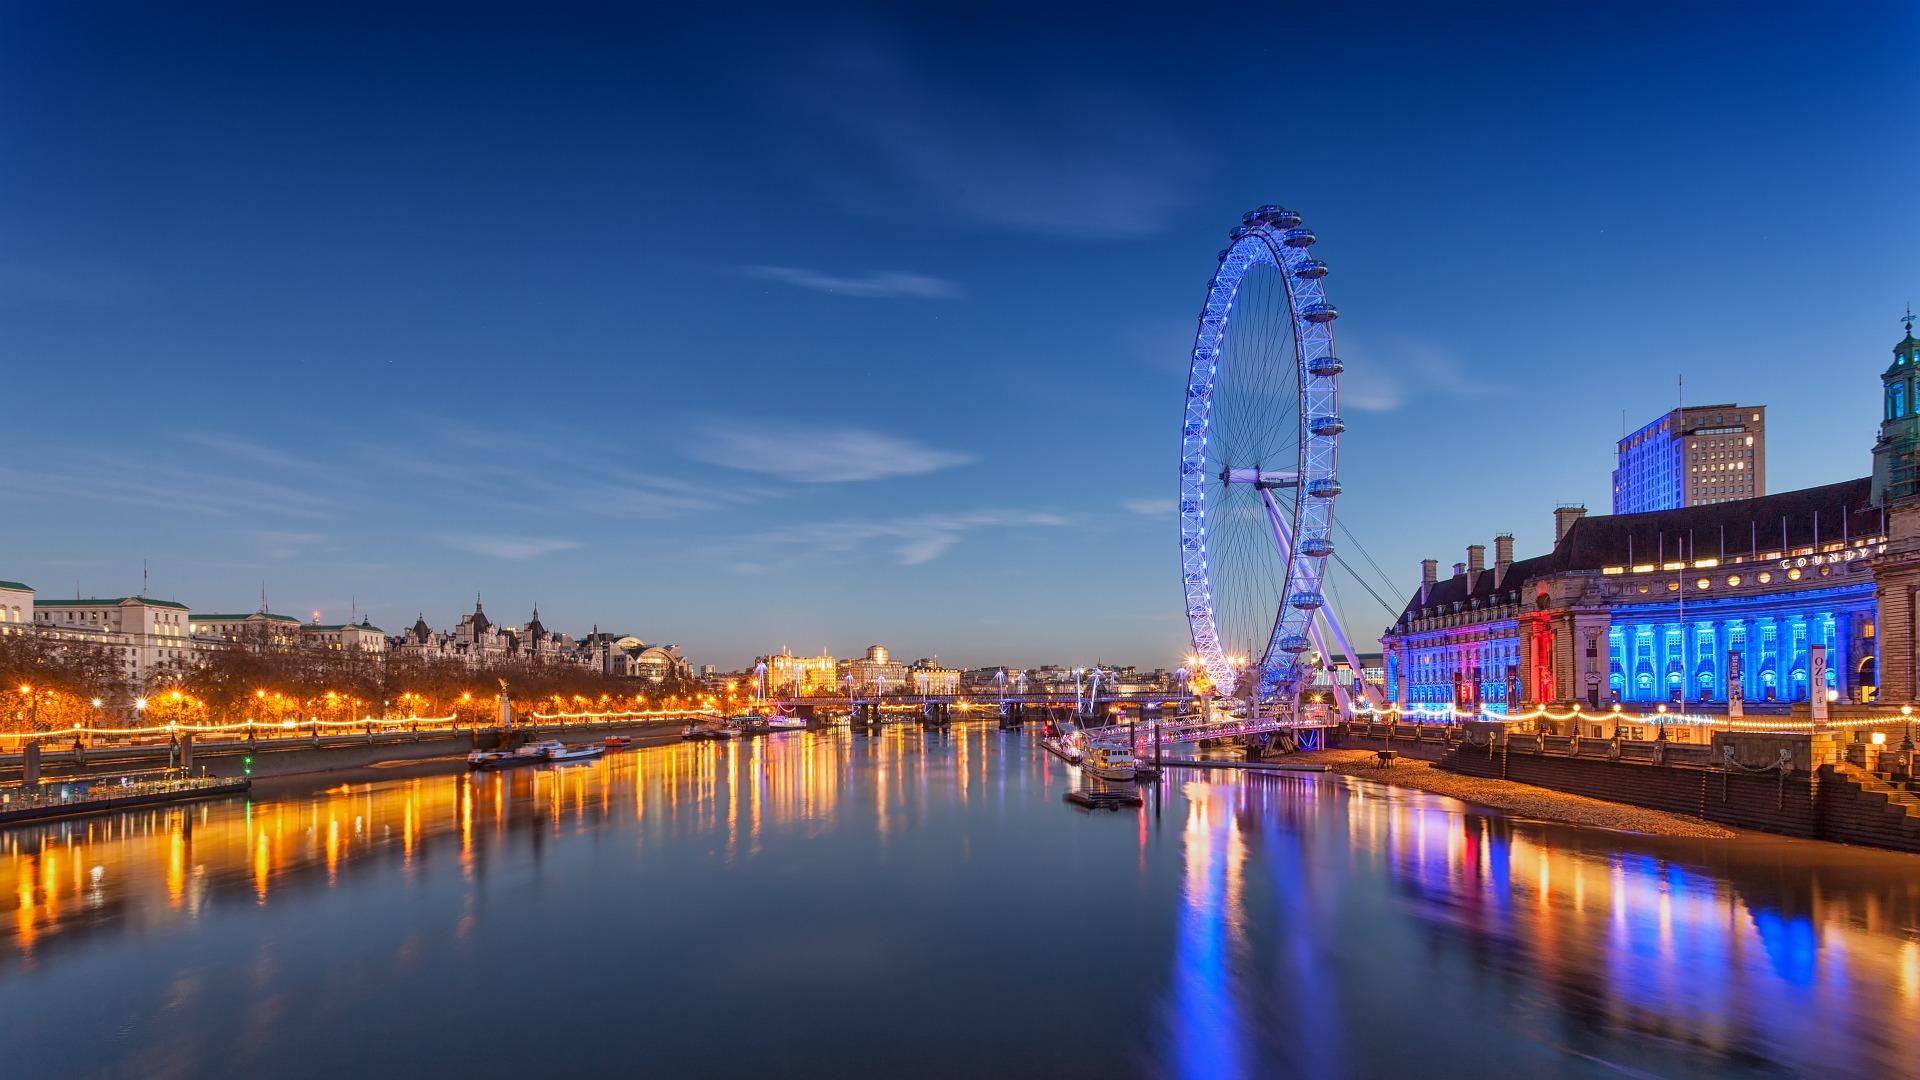 London_CC0.jpg?1545474250